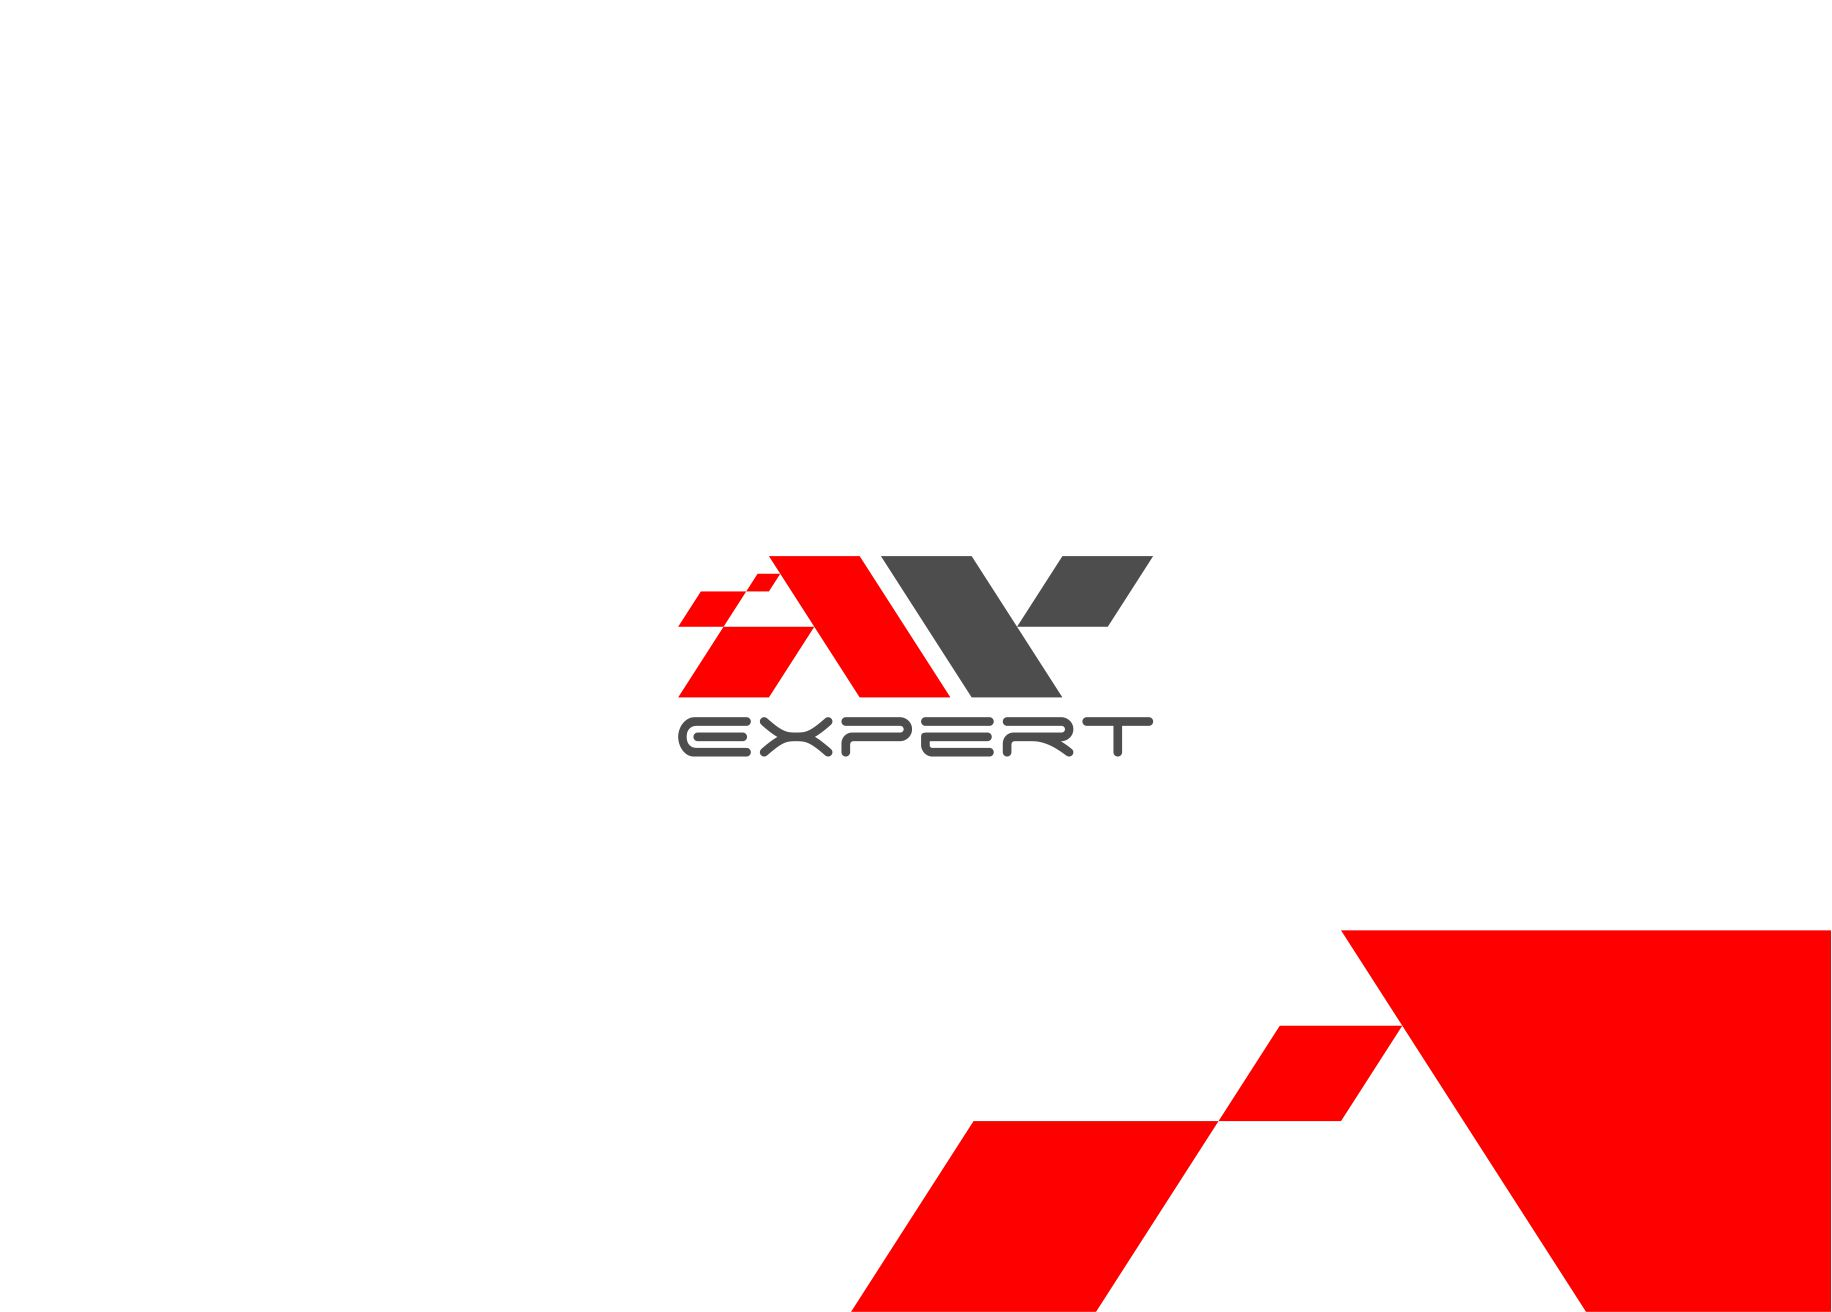 Создание логотипа, фирстиля фото f_7655c61c507cfa2b.jpg